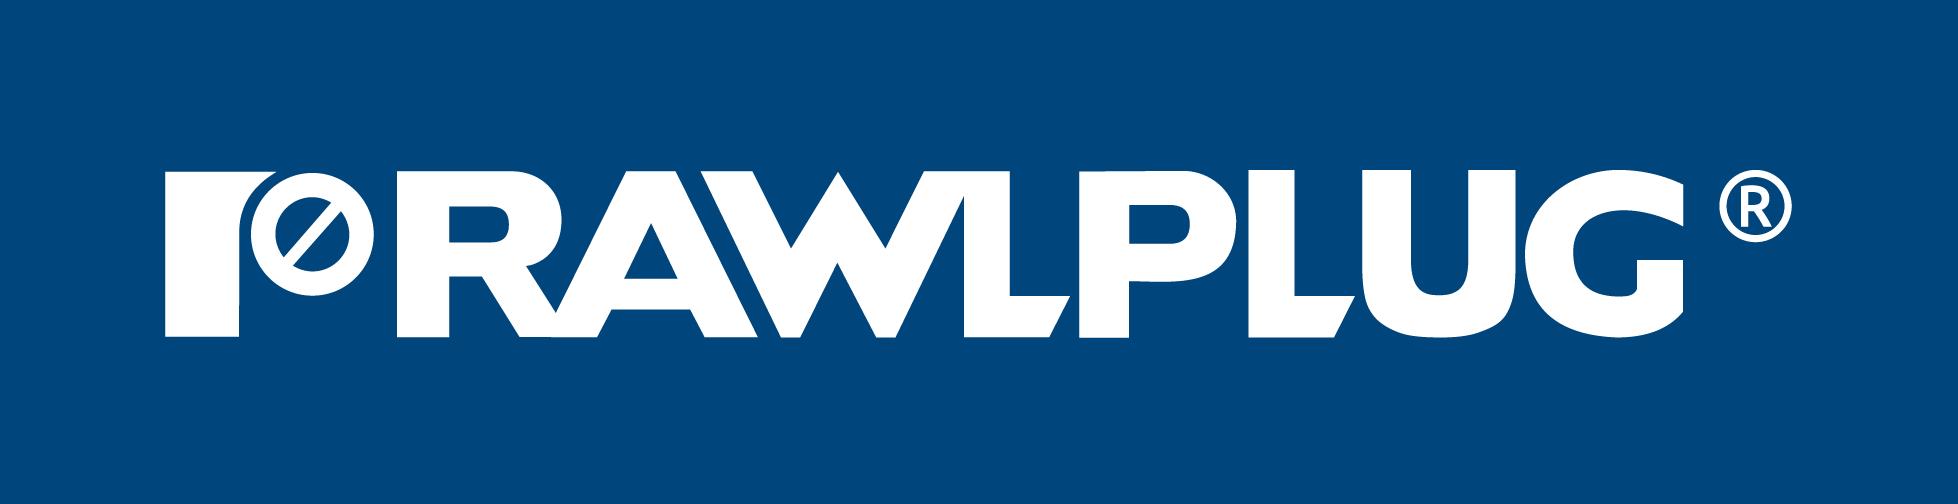 Rawlplug_logo